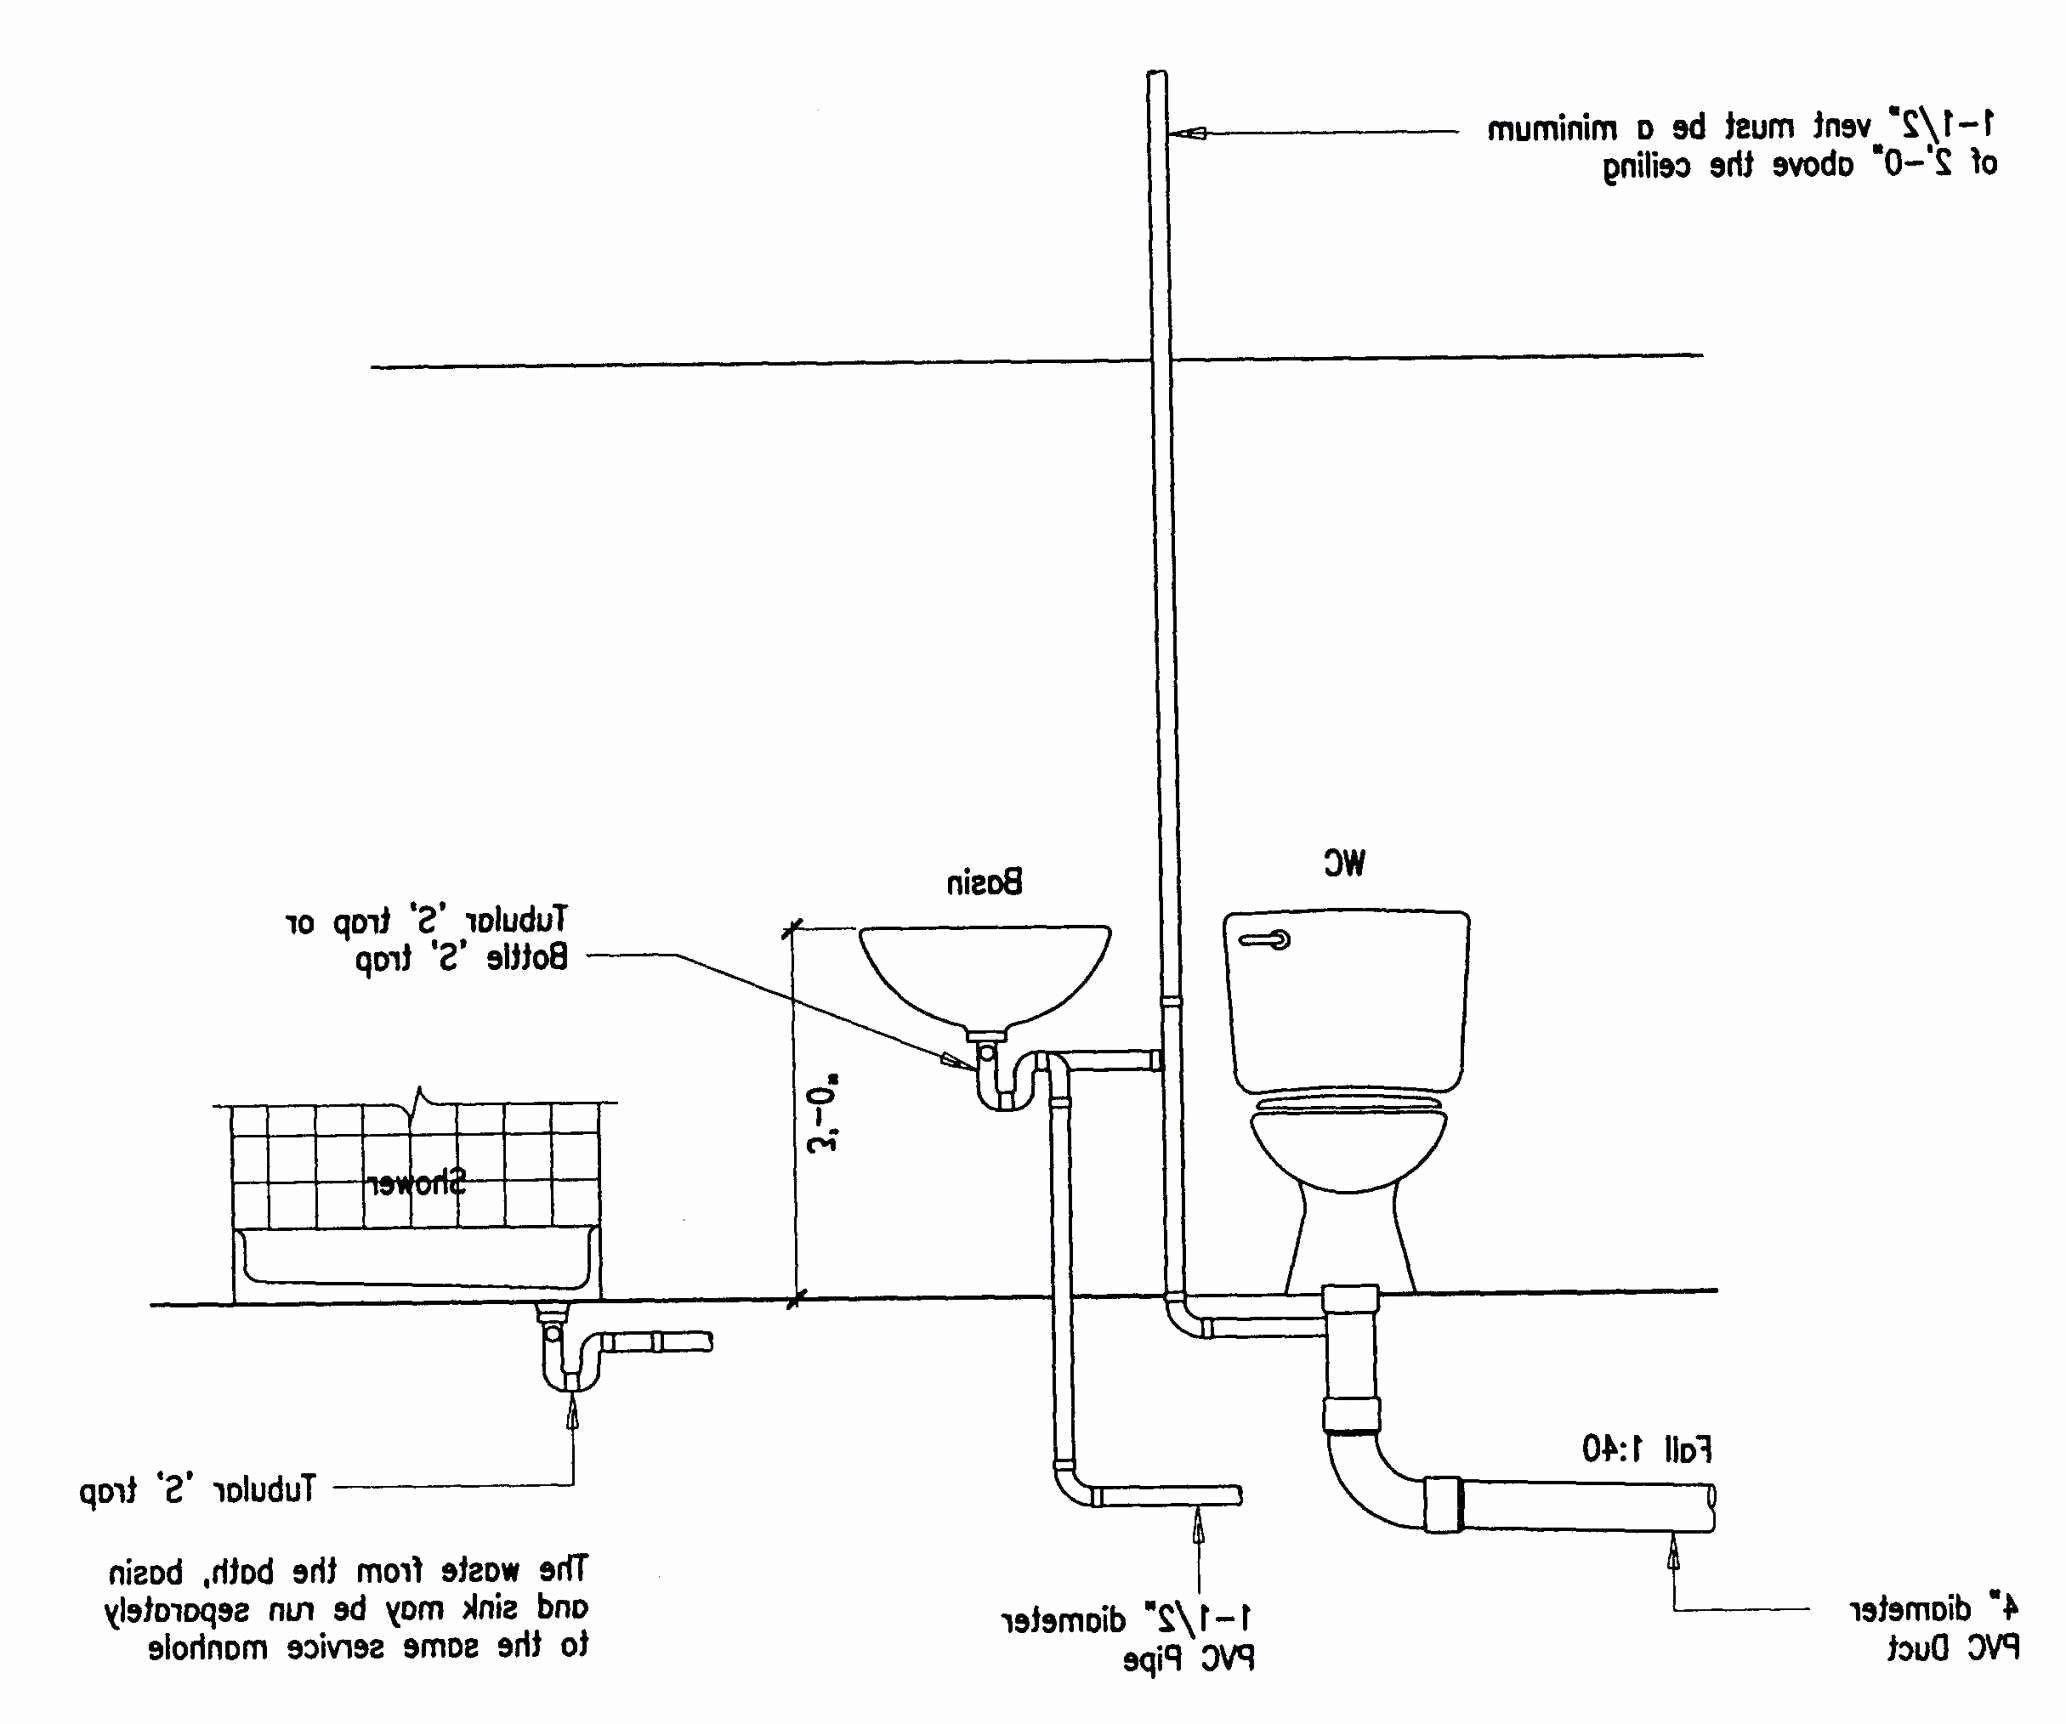 Bathtub Diagram Of Parts In 2021 Install Bathroom Sink Bathroom Sink Drain Kitchen Faucet Parts [ jpg ]